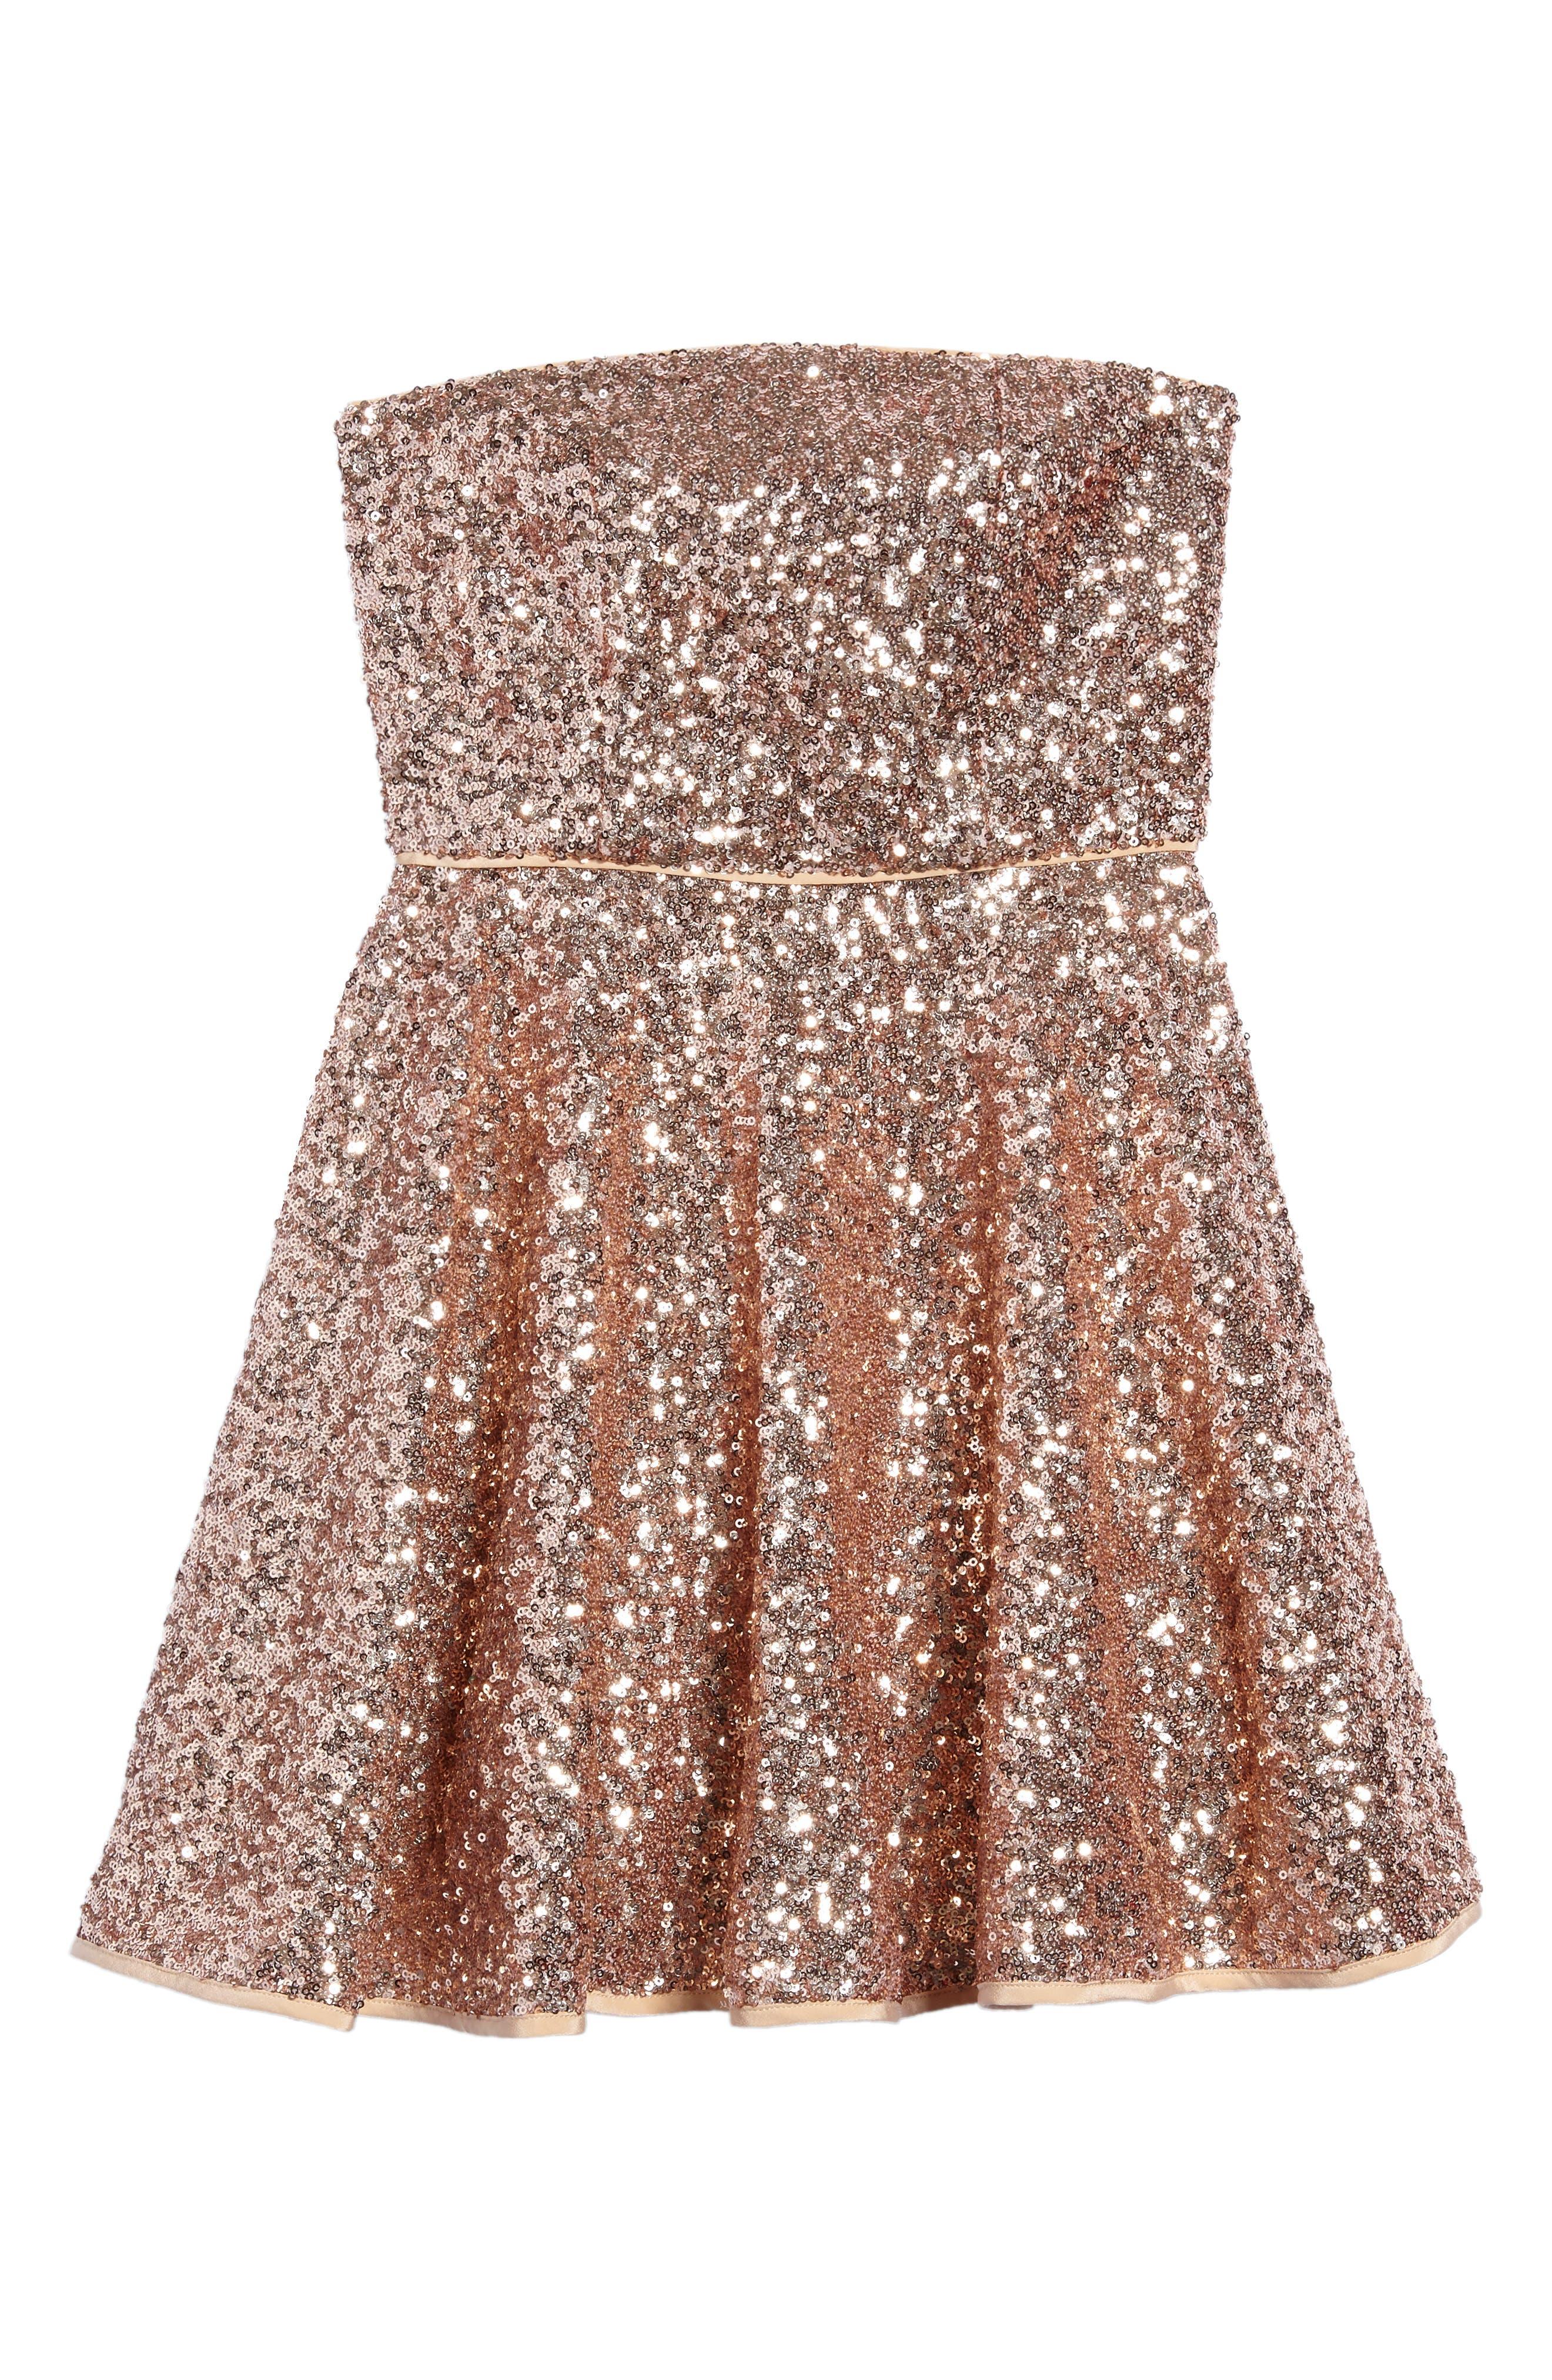 Ellie Sequin Strapless Dress,                             Main thumbnail 1, color,                             Rose Gold